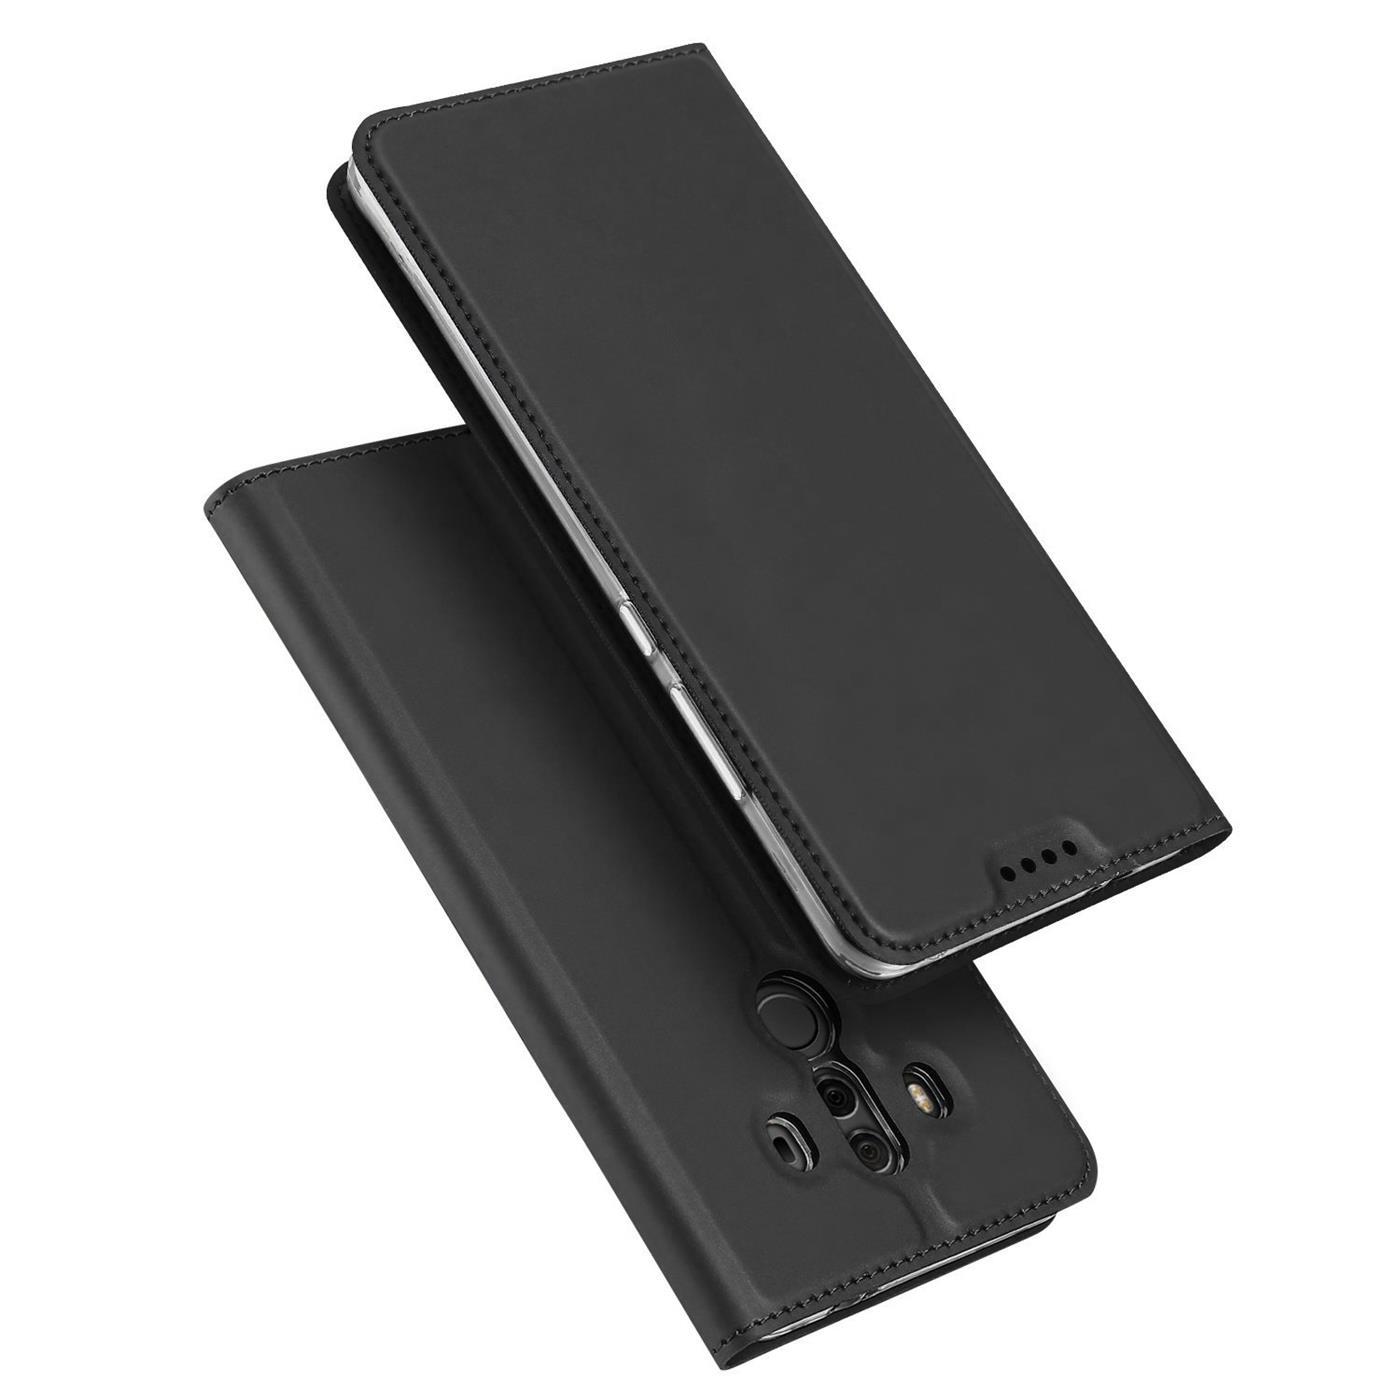 Funda-para-Movil-Huawei-Mate-10-Pro-Libro-Protectora-Slim-Flip-Estuche miniatura 9